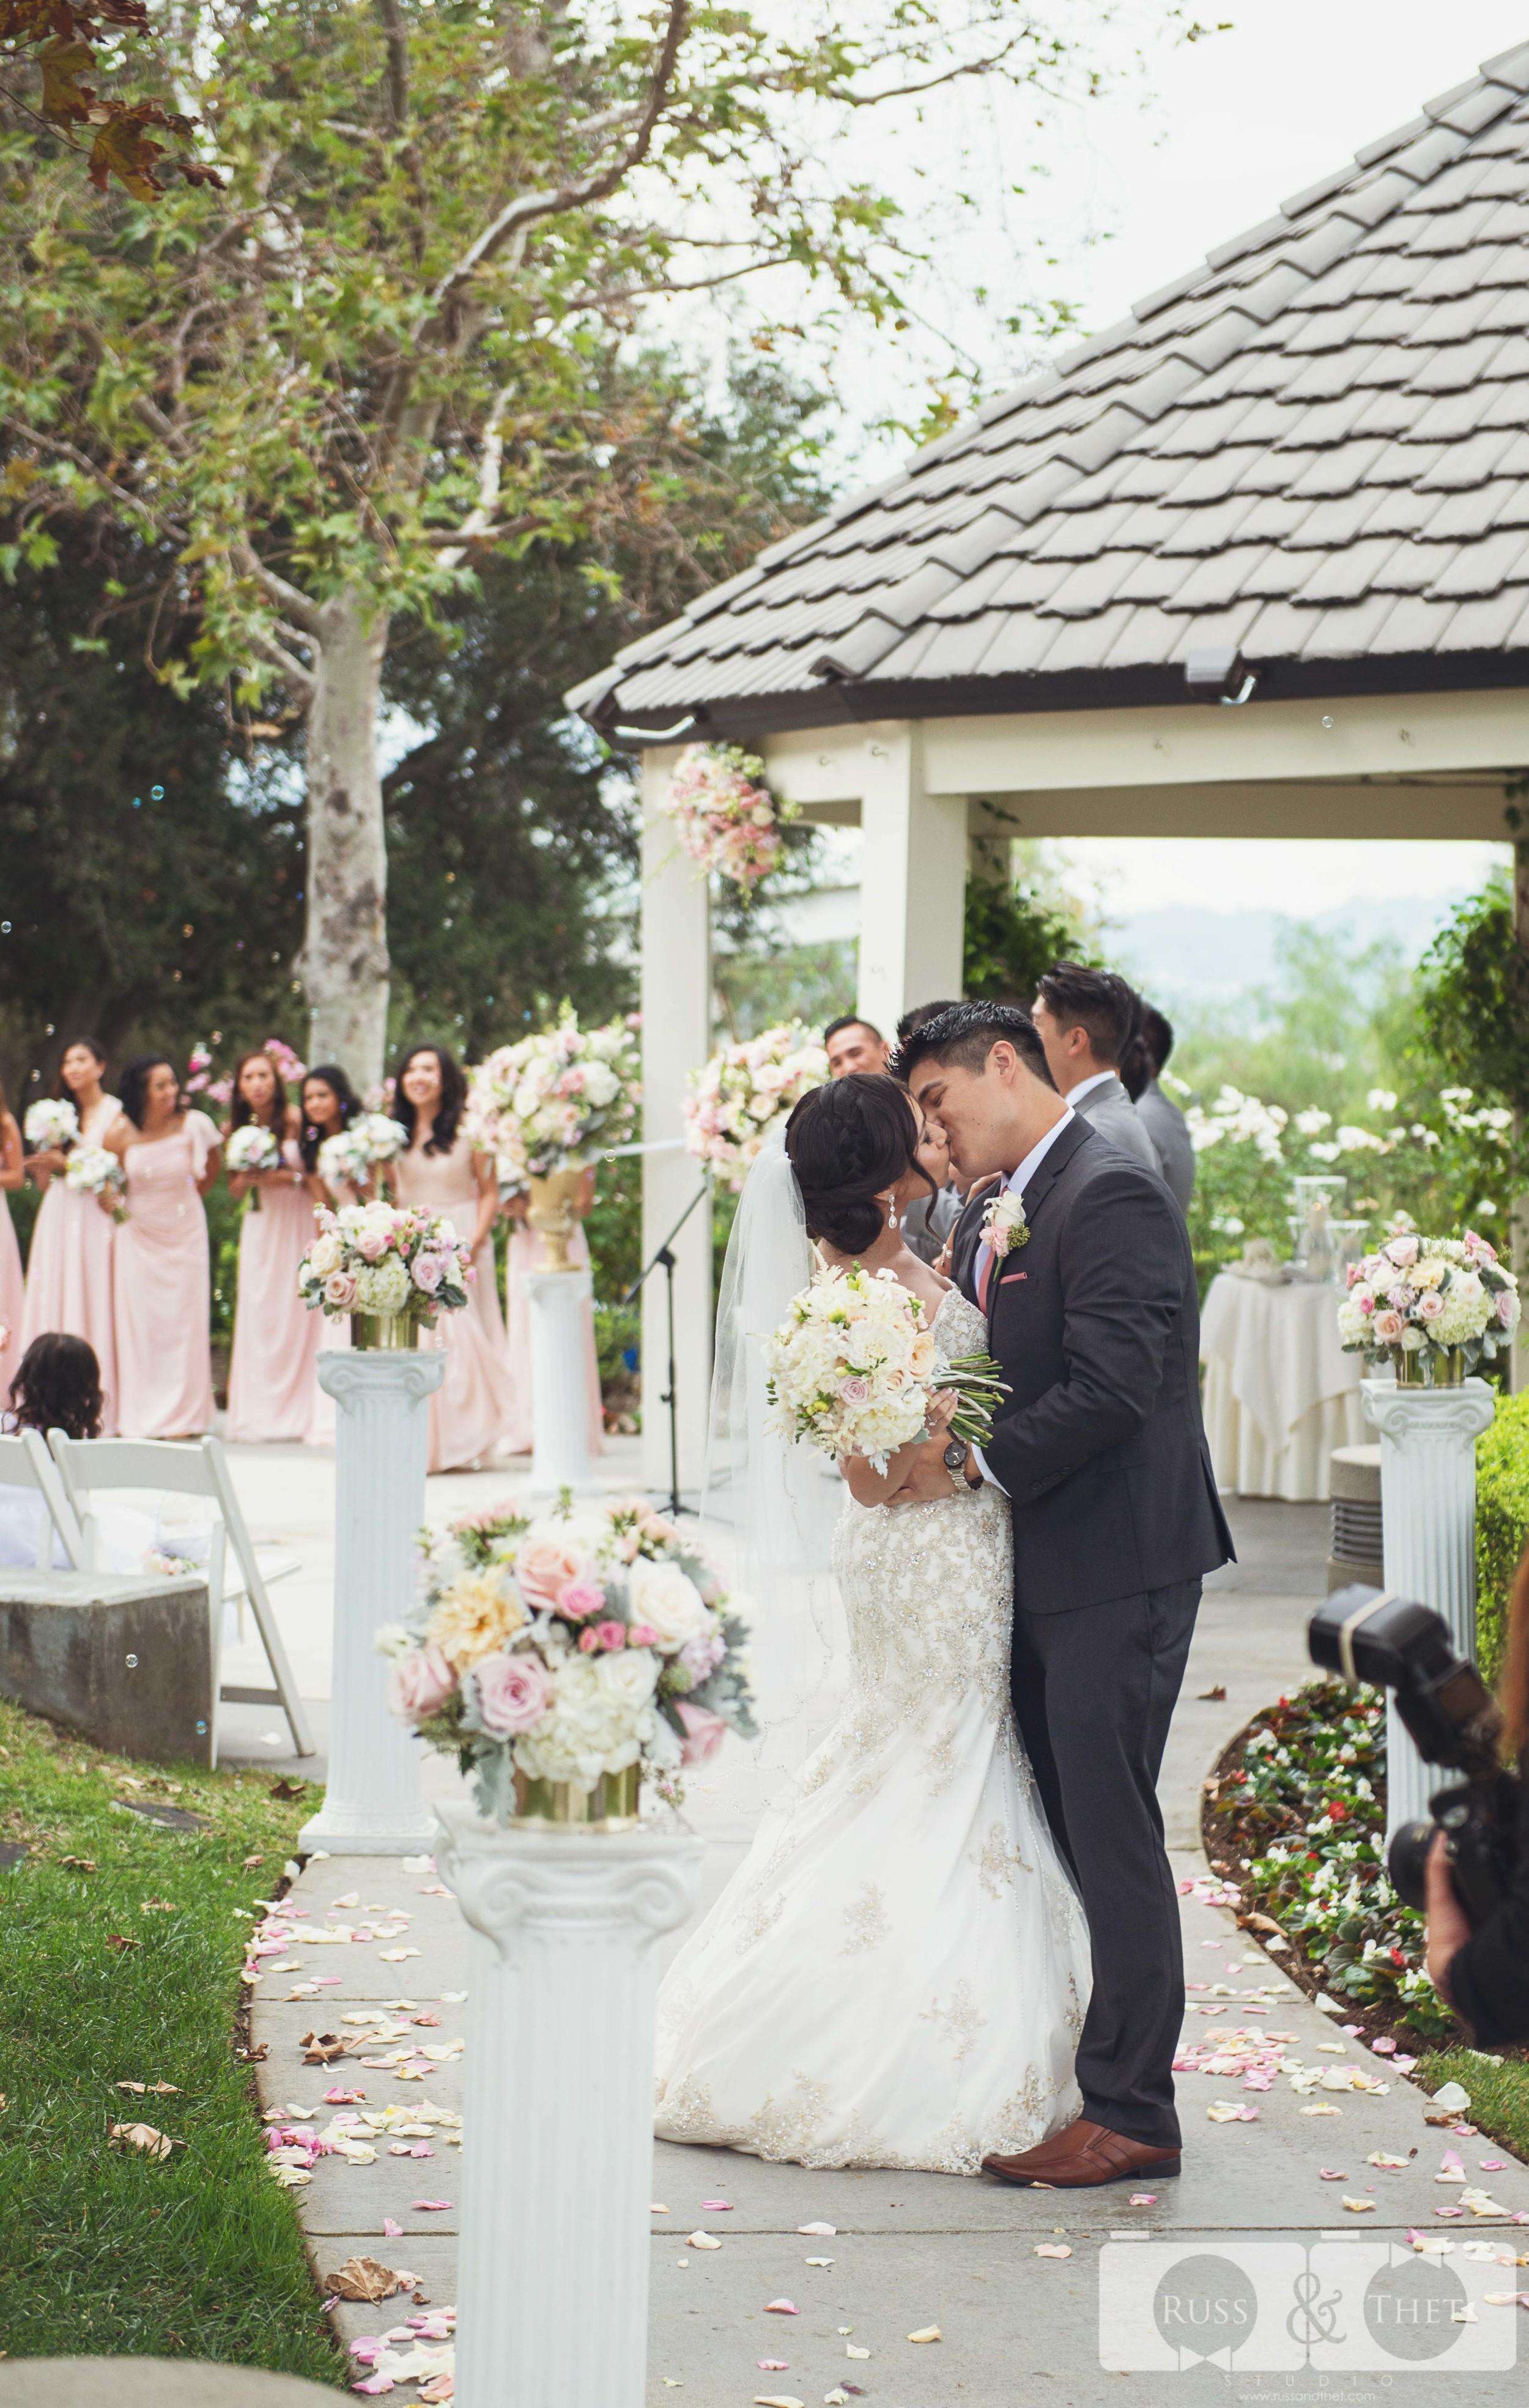 summit-house-fullerton-wedding-photographer-95.JPG